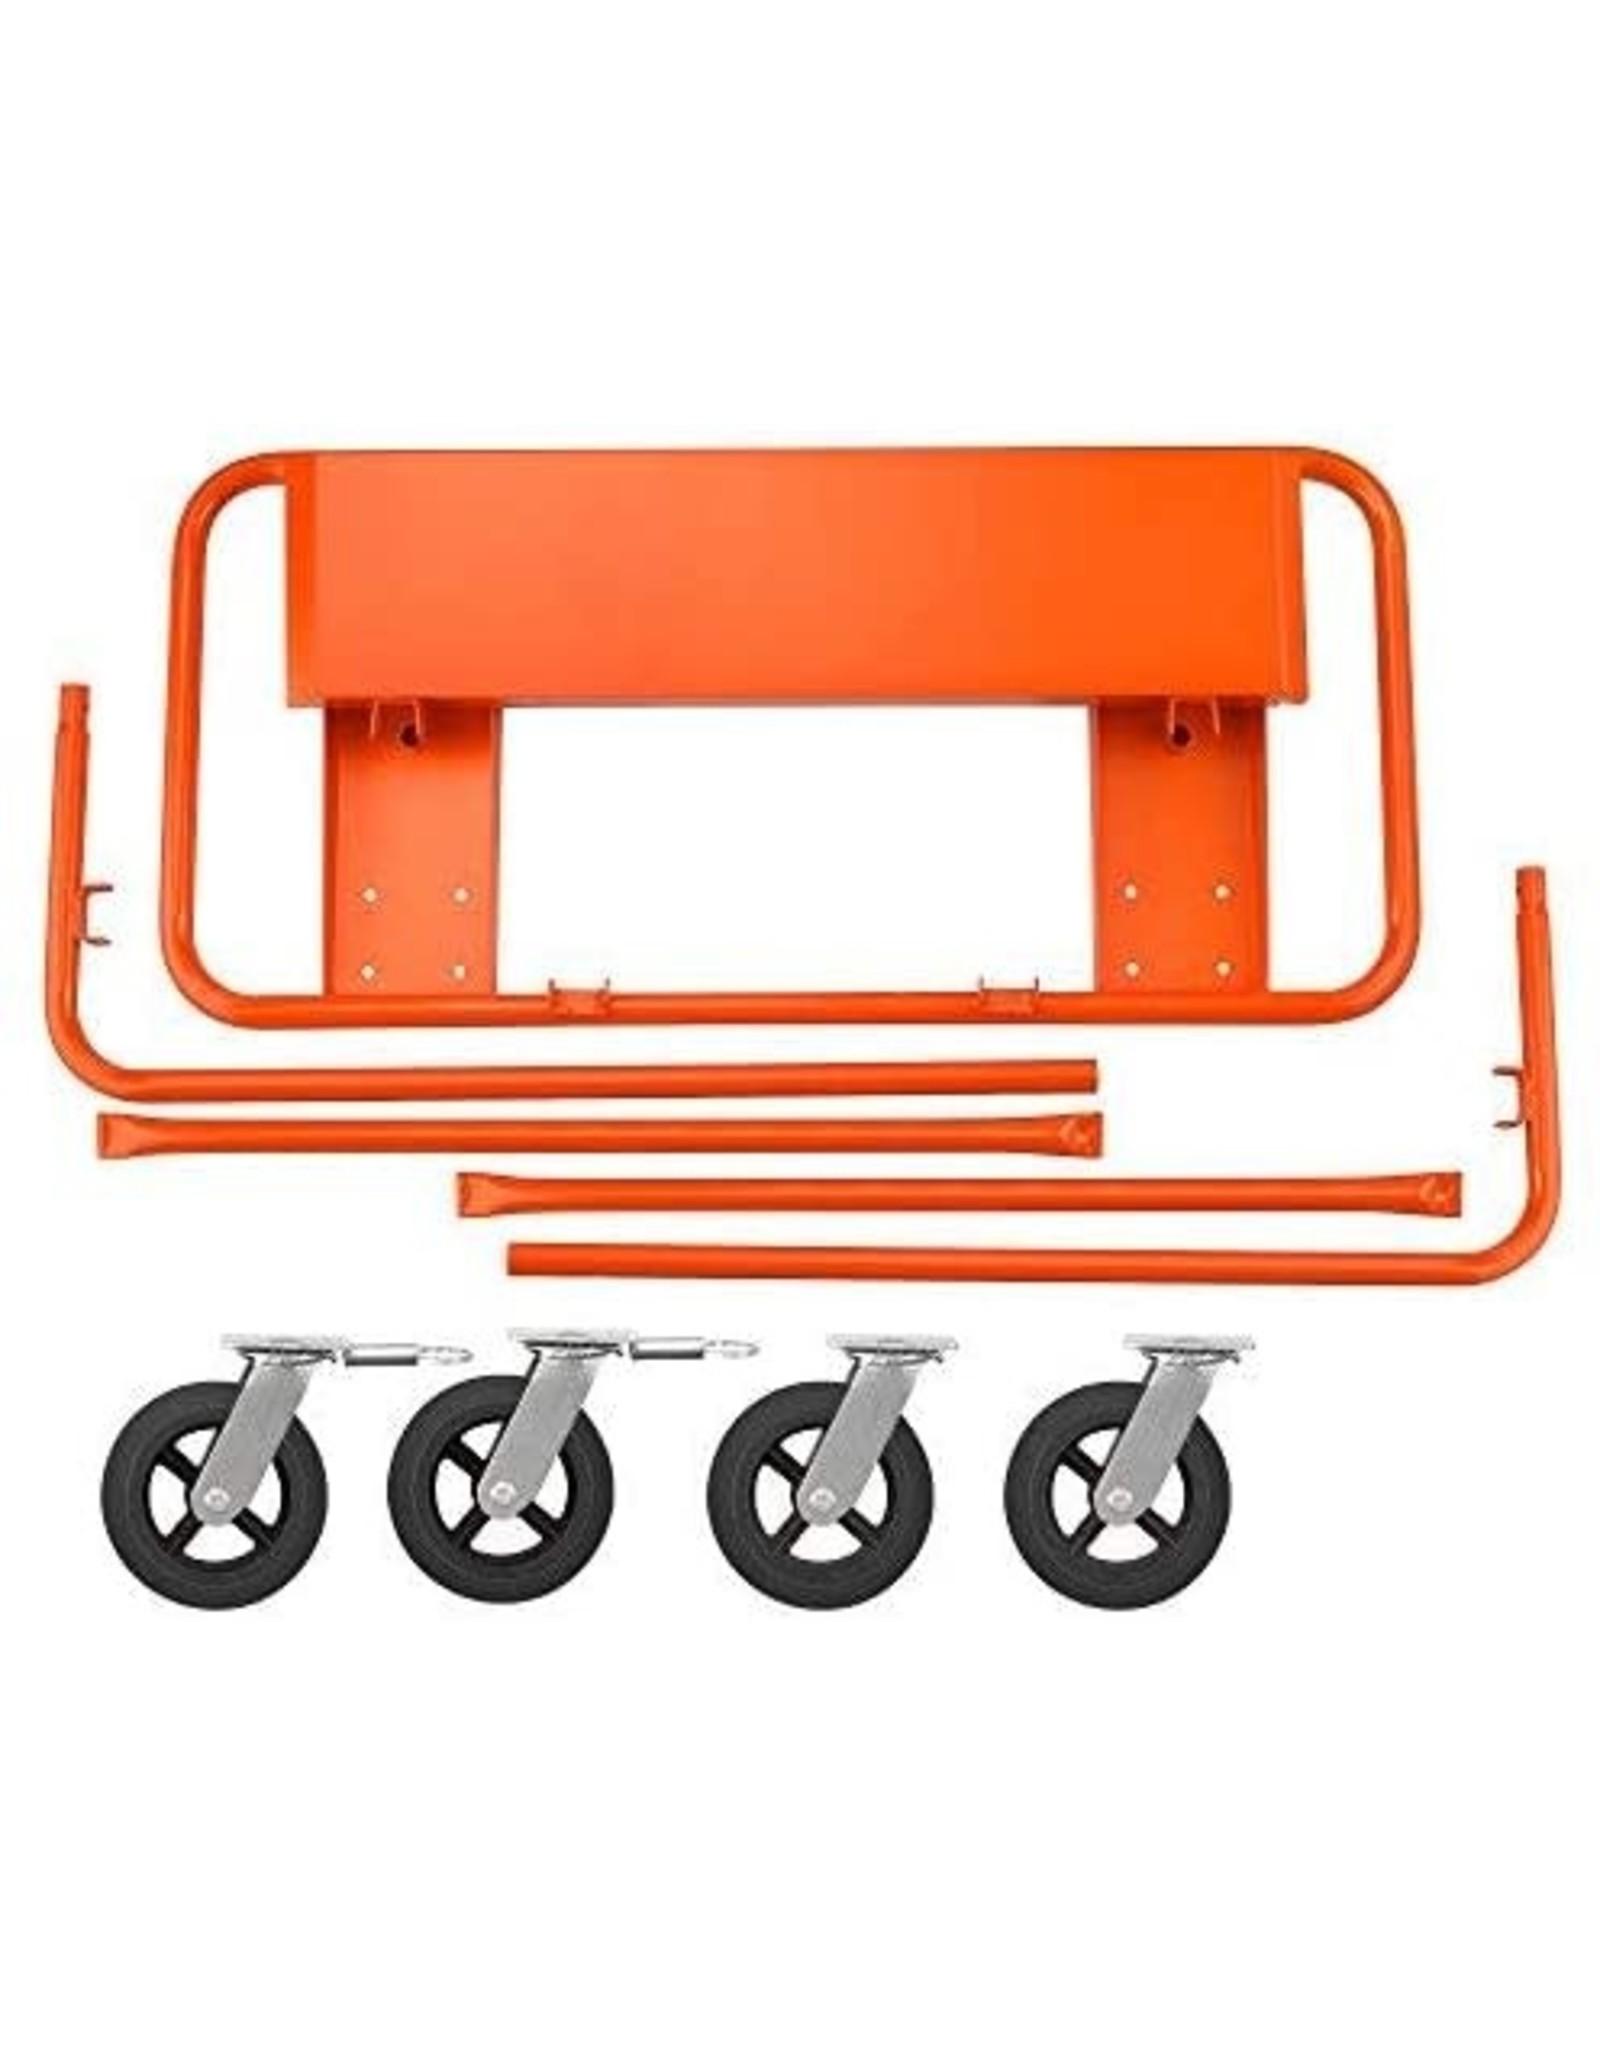 PENTAGON TOOLS 6115 Pentagon Tool Professional Drywall Cart Dolly For Handling Wall Panels